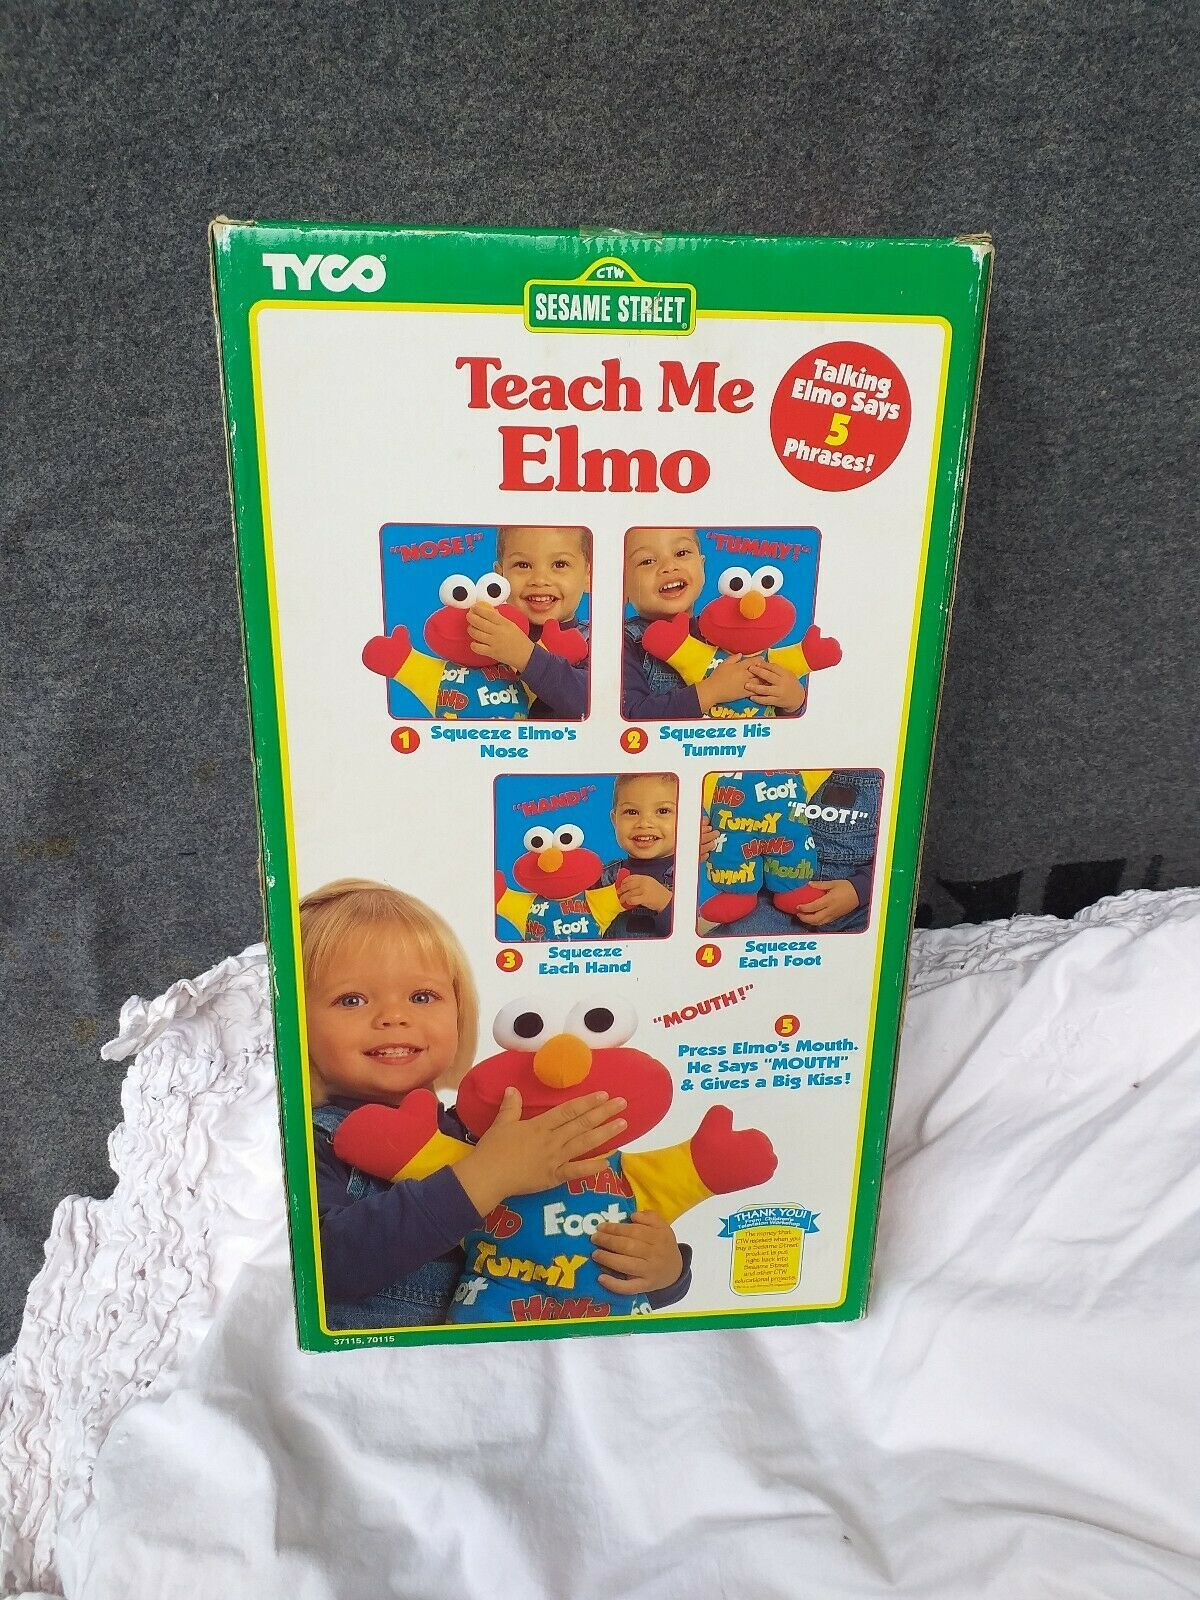 New Box Vintage Teach Me Elmo Original 90's 1996 Tyco Plush Doll Sesame Street image 6